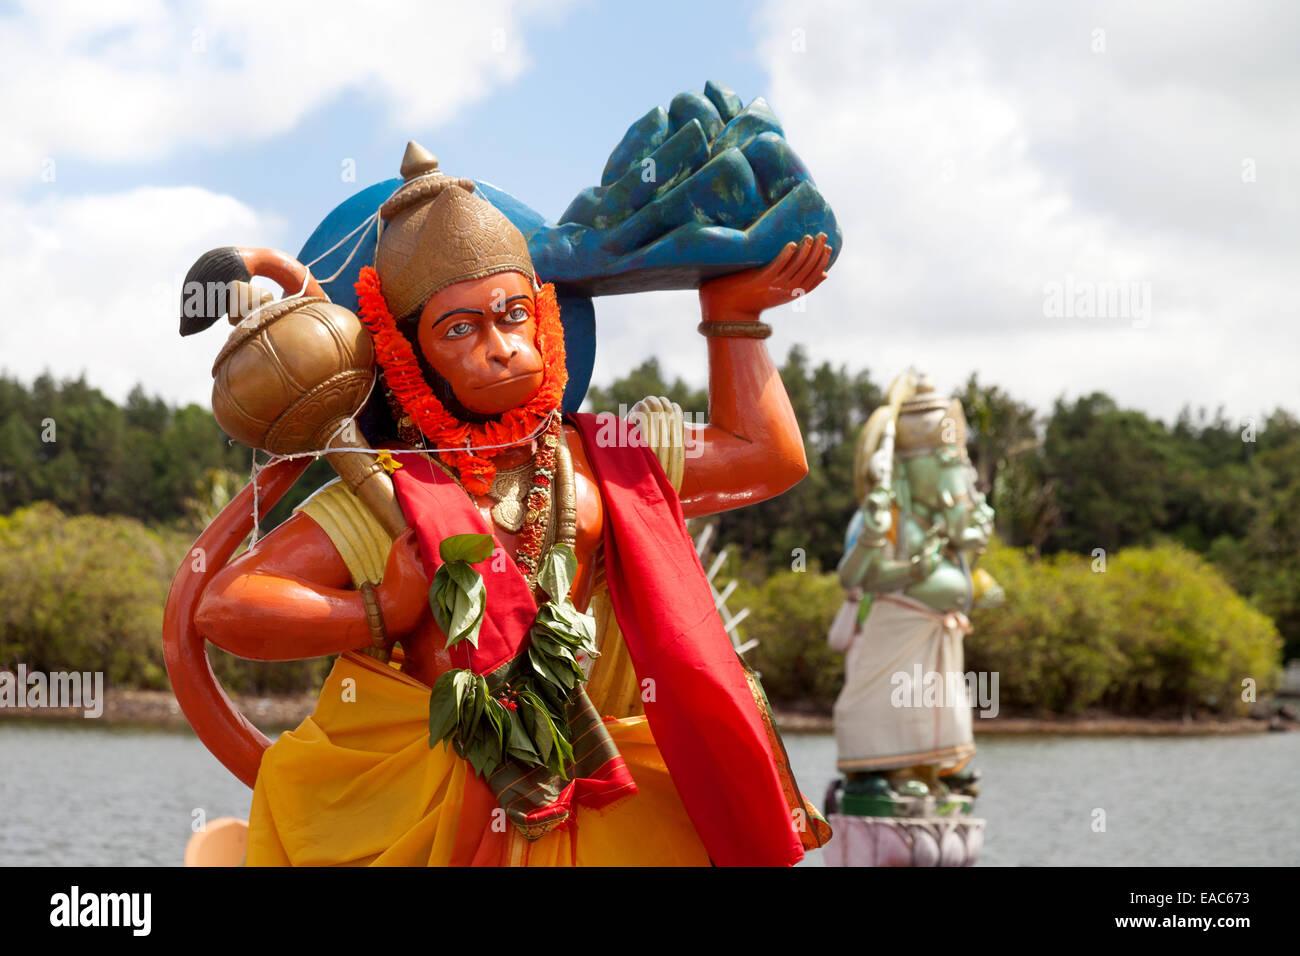 Statues of Hindu gods, Hanuman in the foreground and Ganesha, Grand Bassin Hindu temple, Mauritius - Stock Image